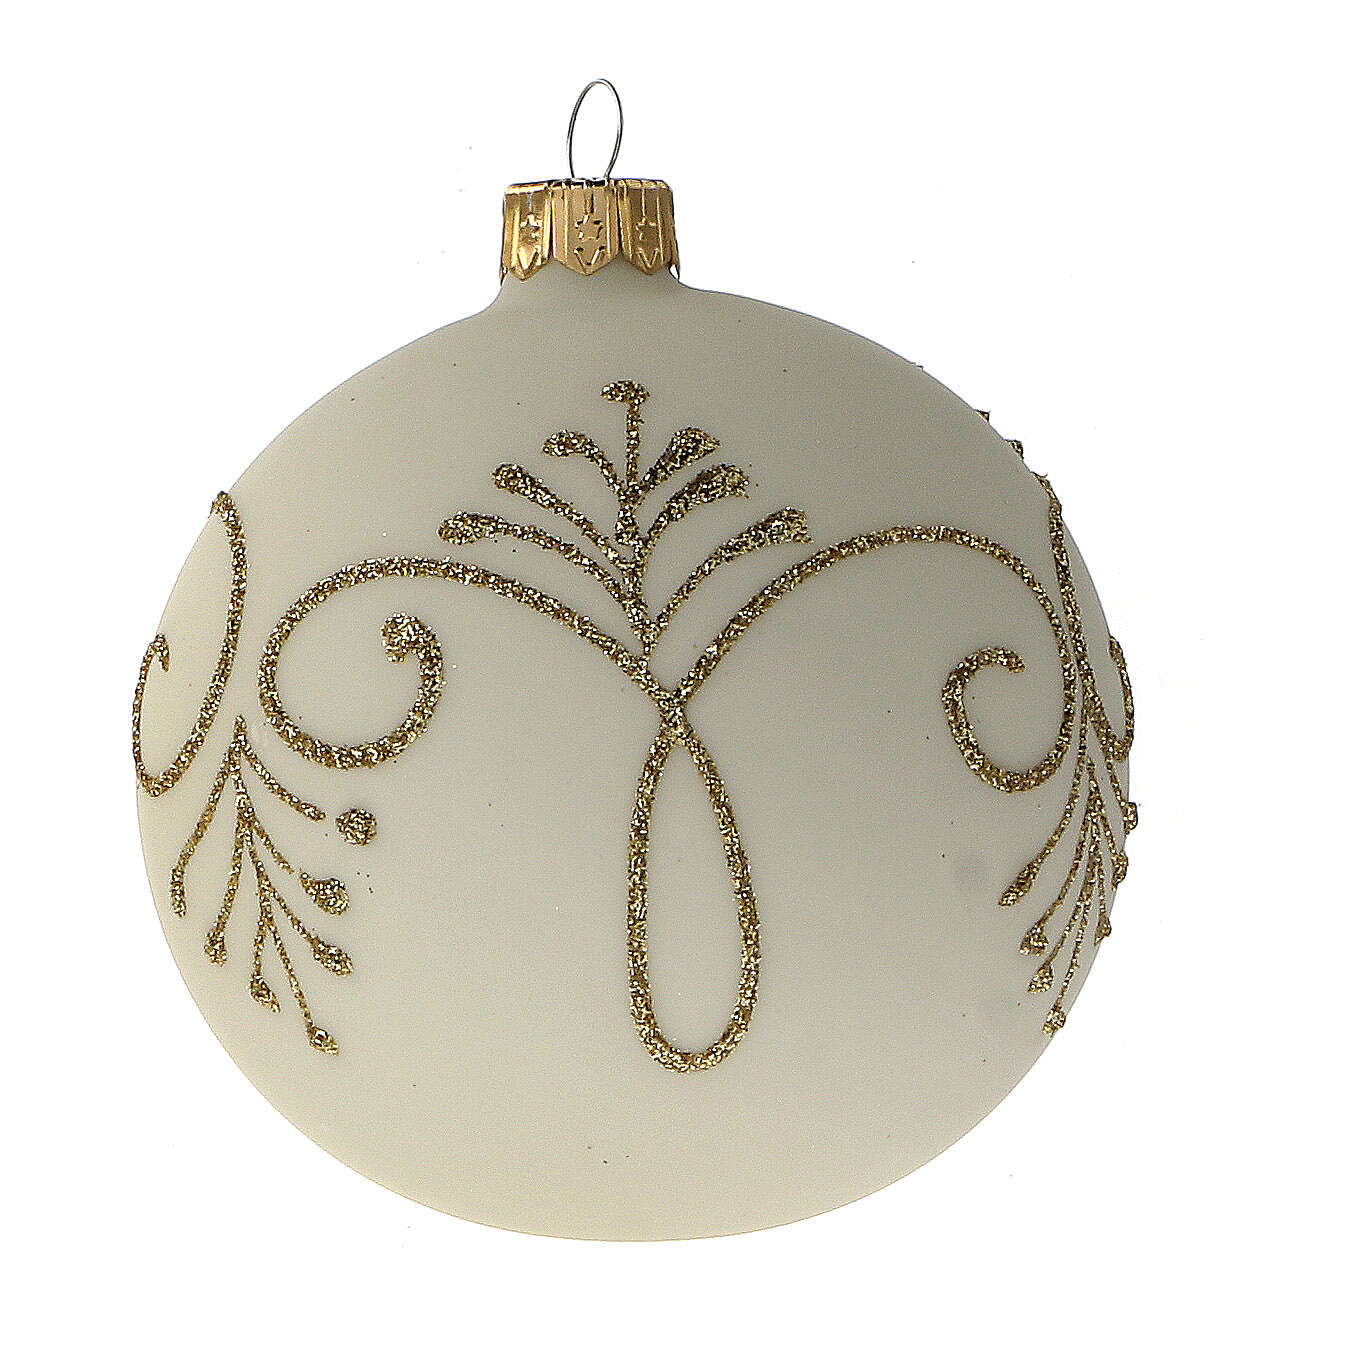 Pallina albero Natale bianco opaco oro vetro soffiato 80 mm 6 pz 4